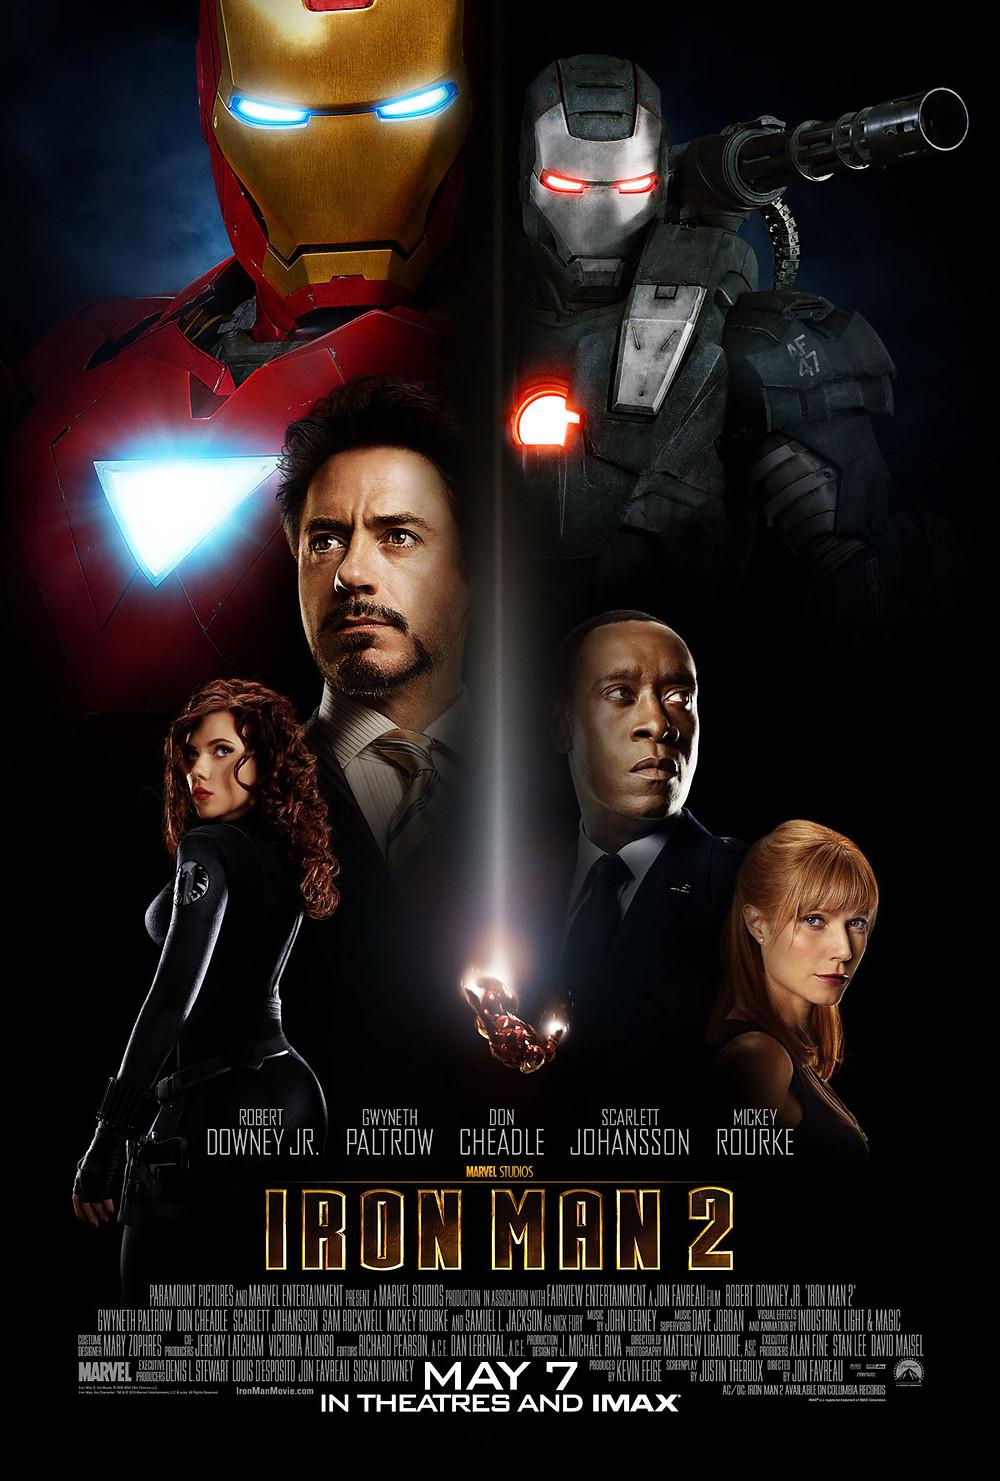 Iron-Man-2-01.jpg